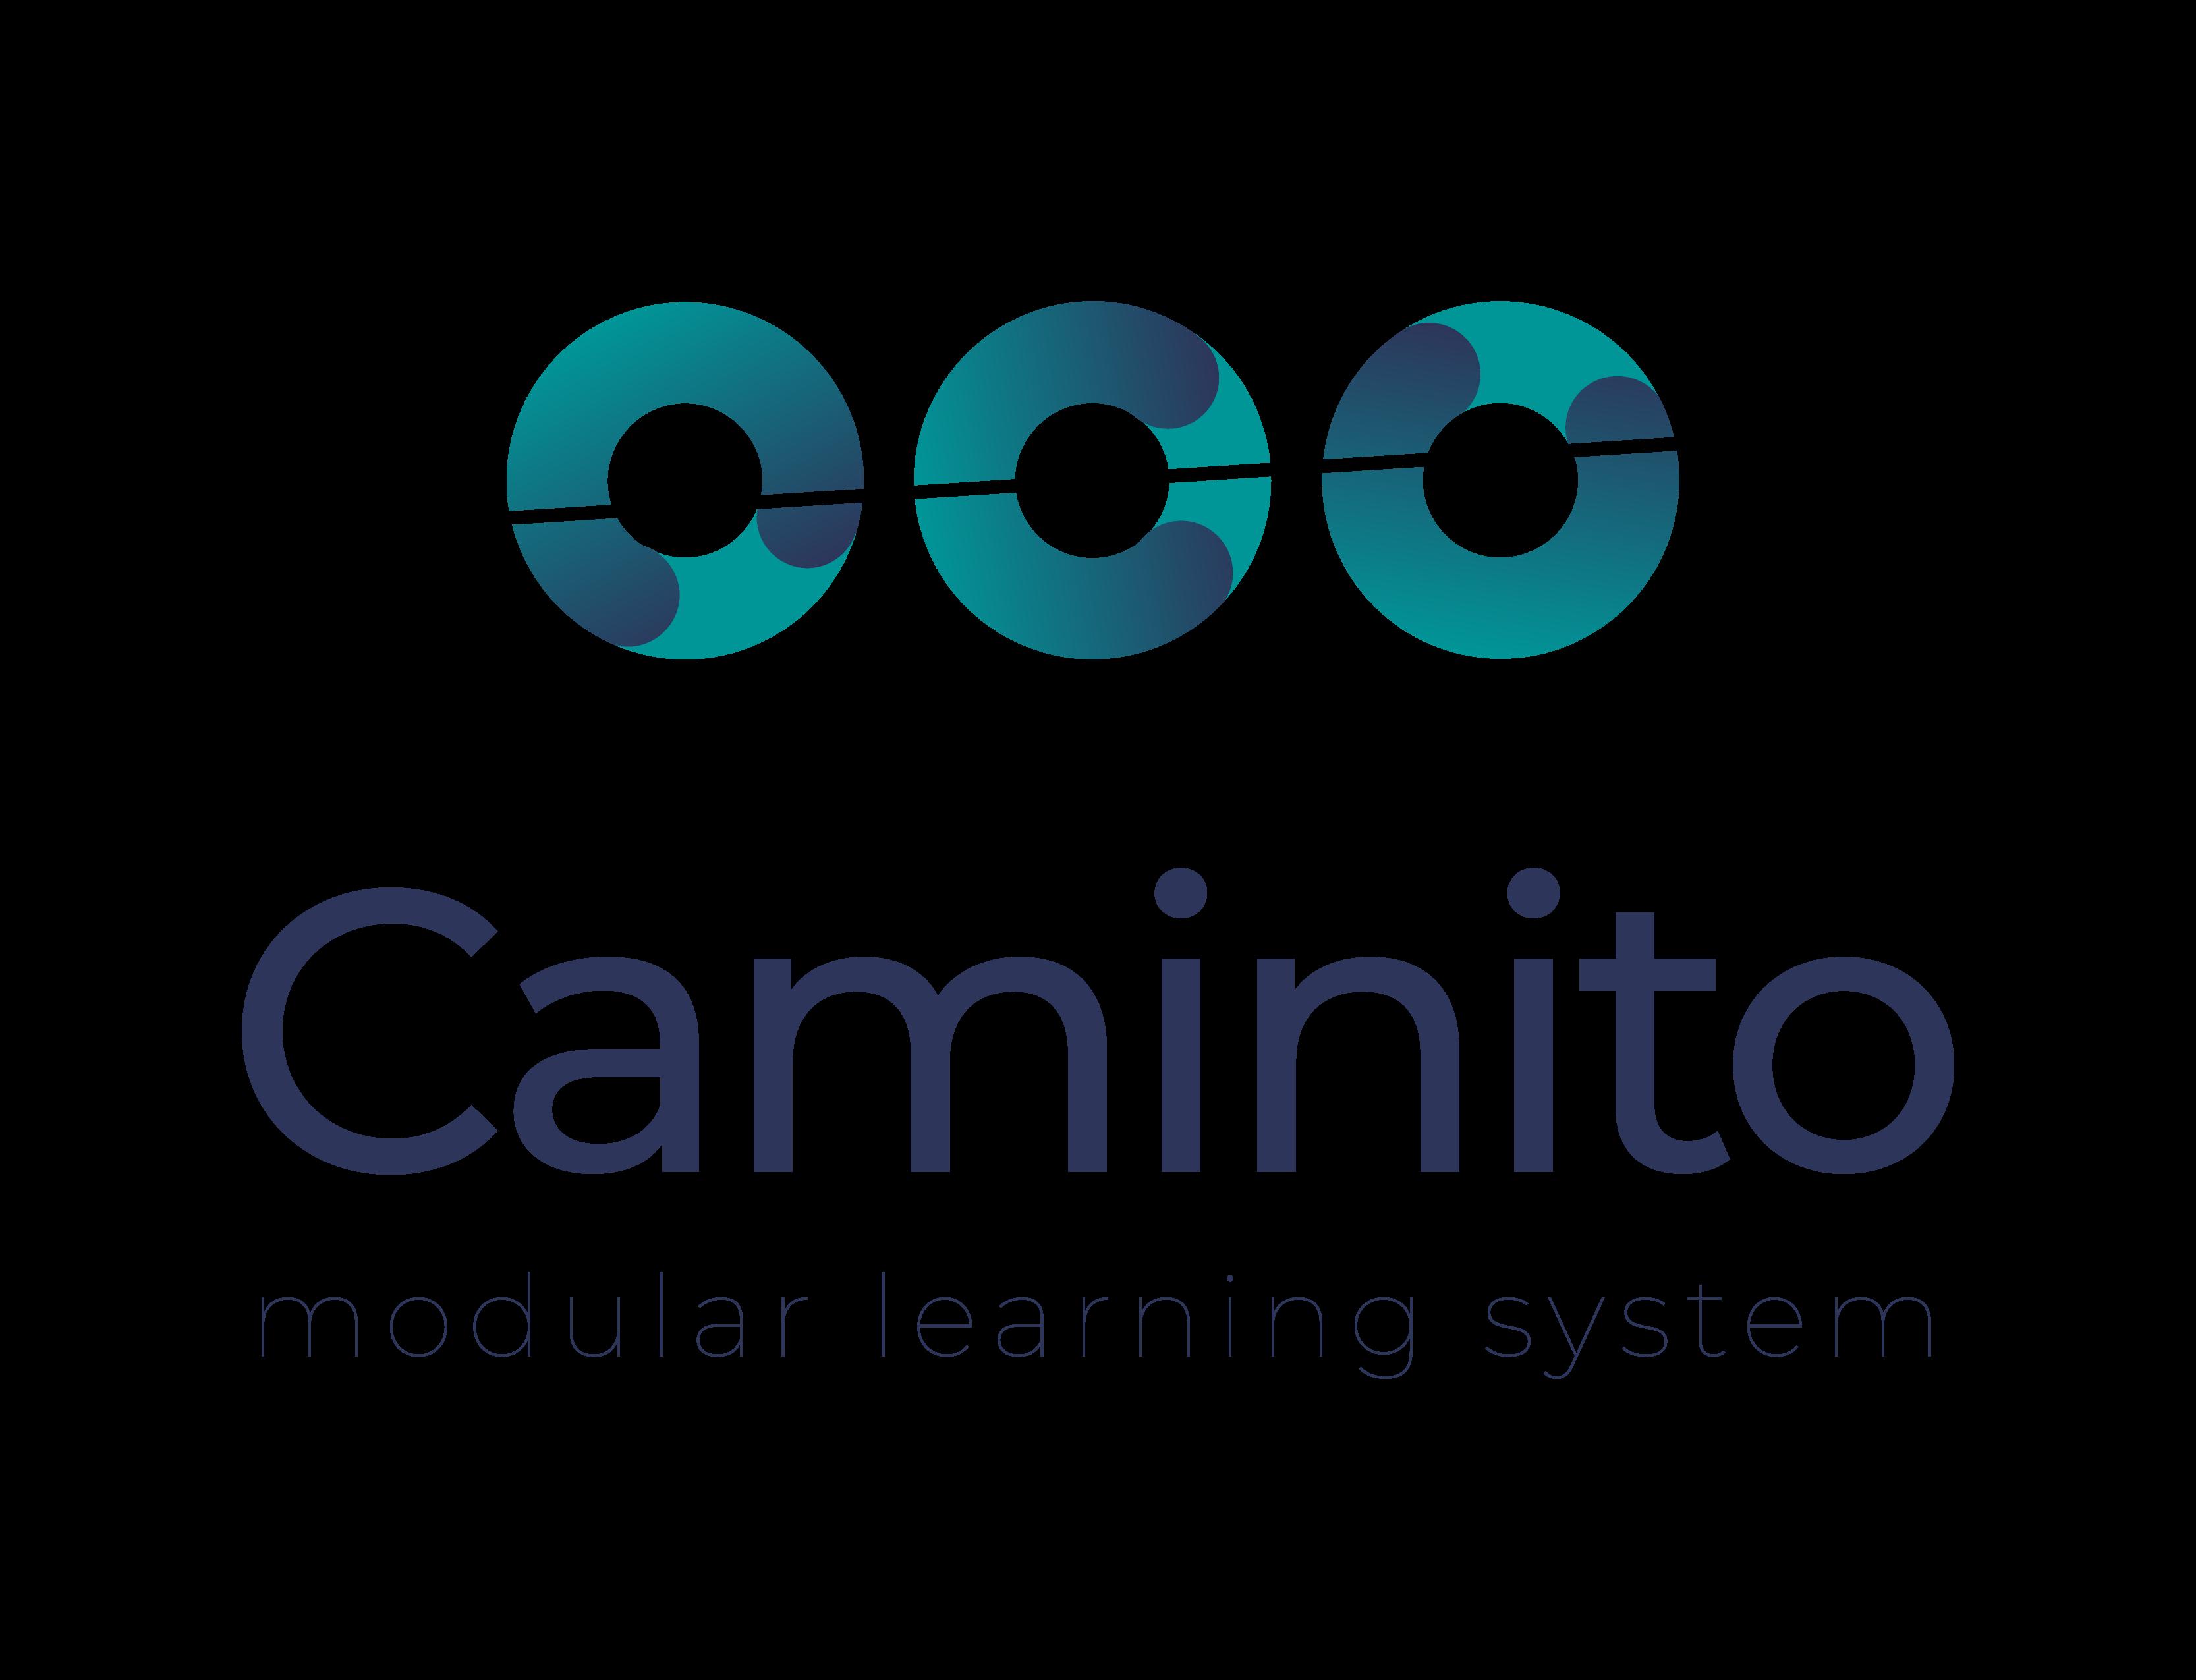 Caminito modular learning system